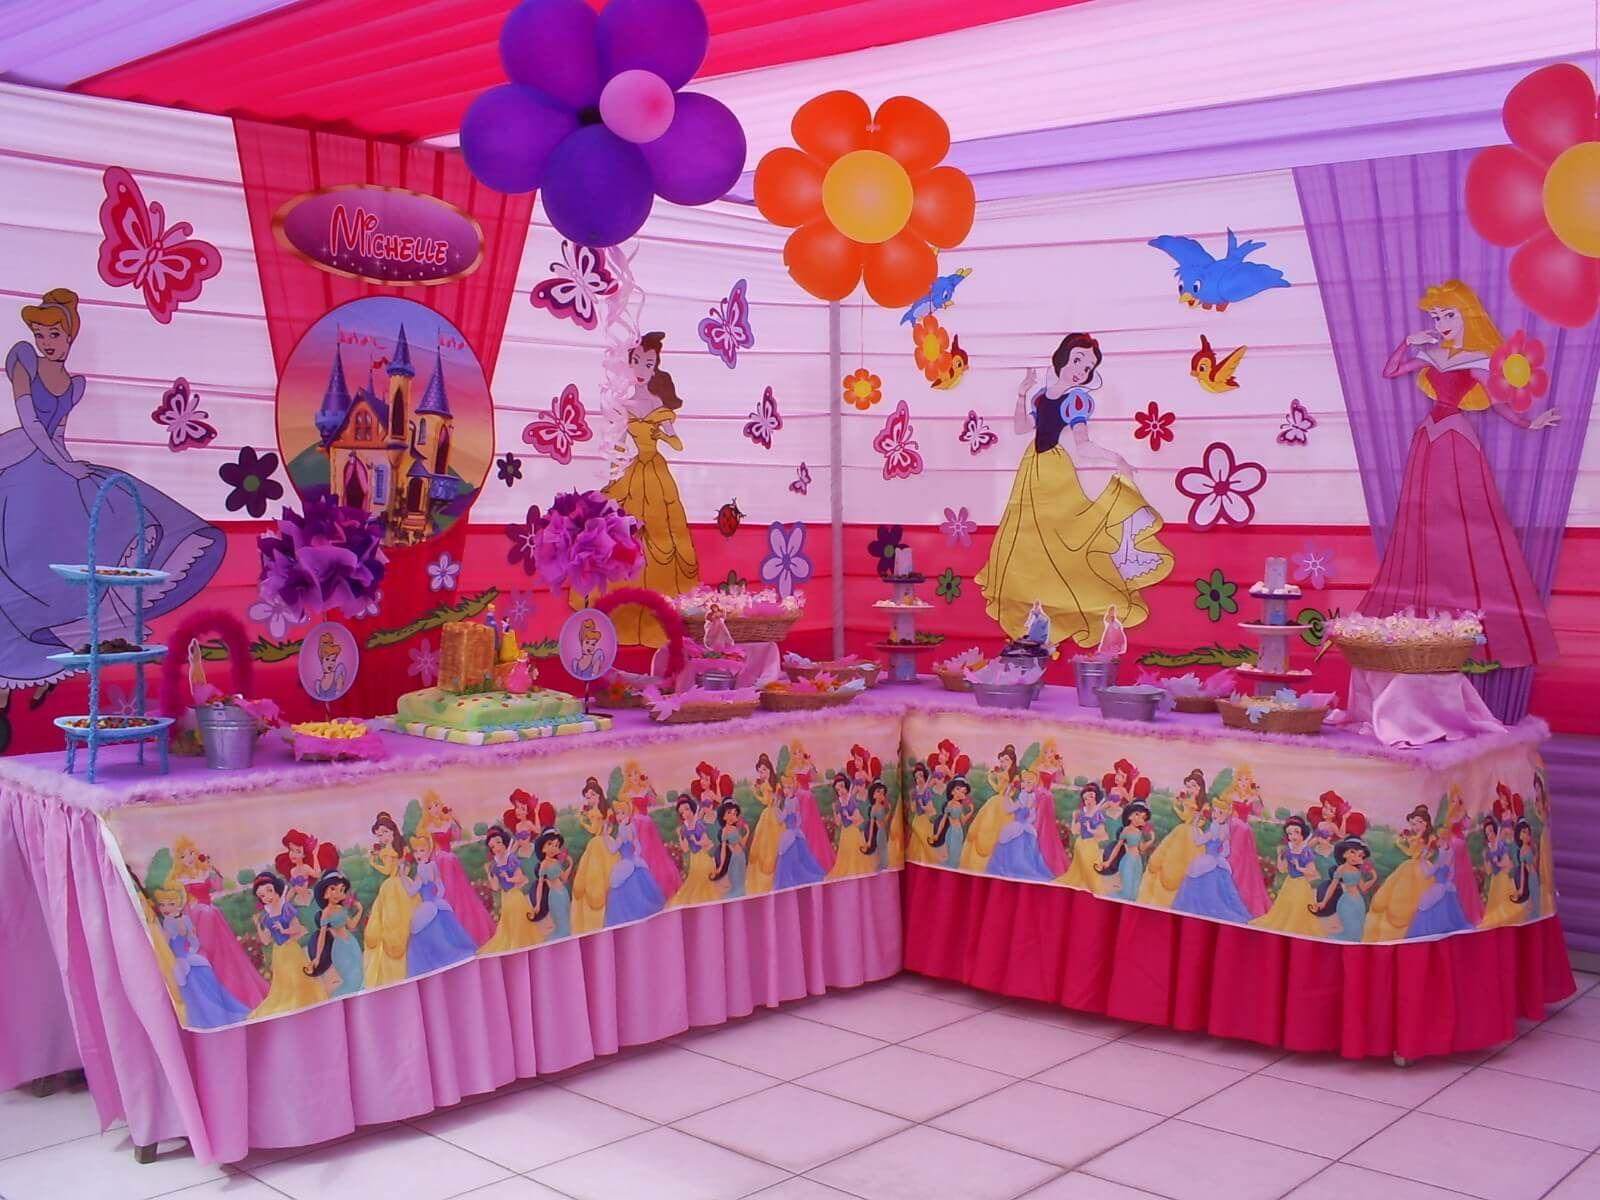 Decoracion de fiestas 1600 1200 - Decoracion para fiesta infantil ...